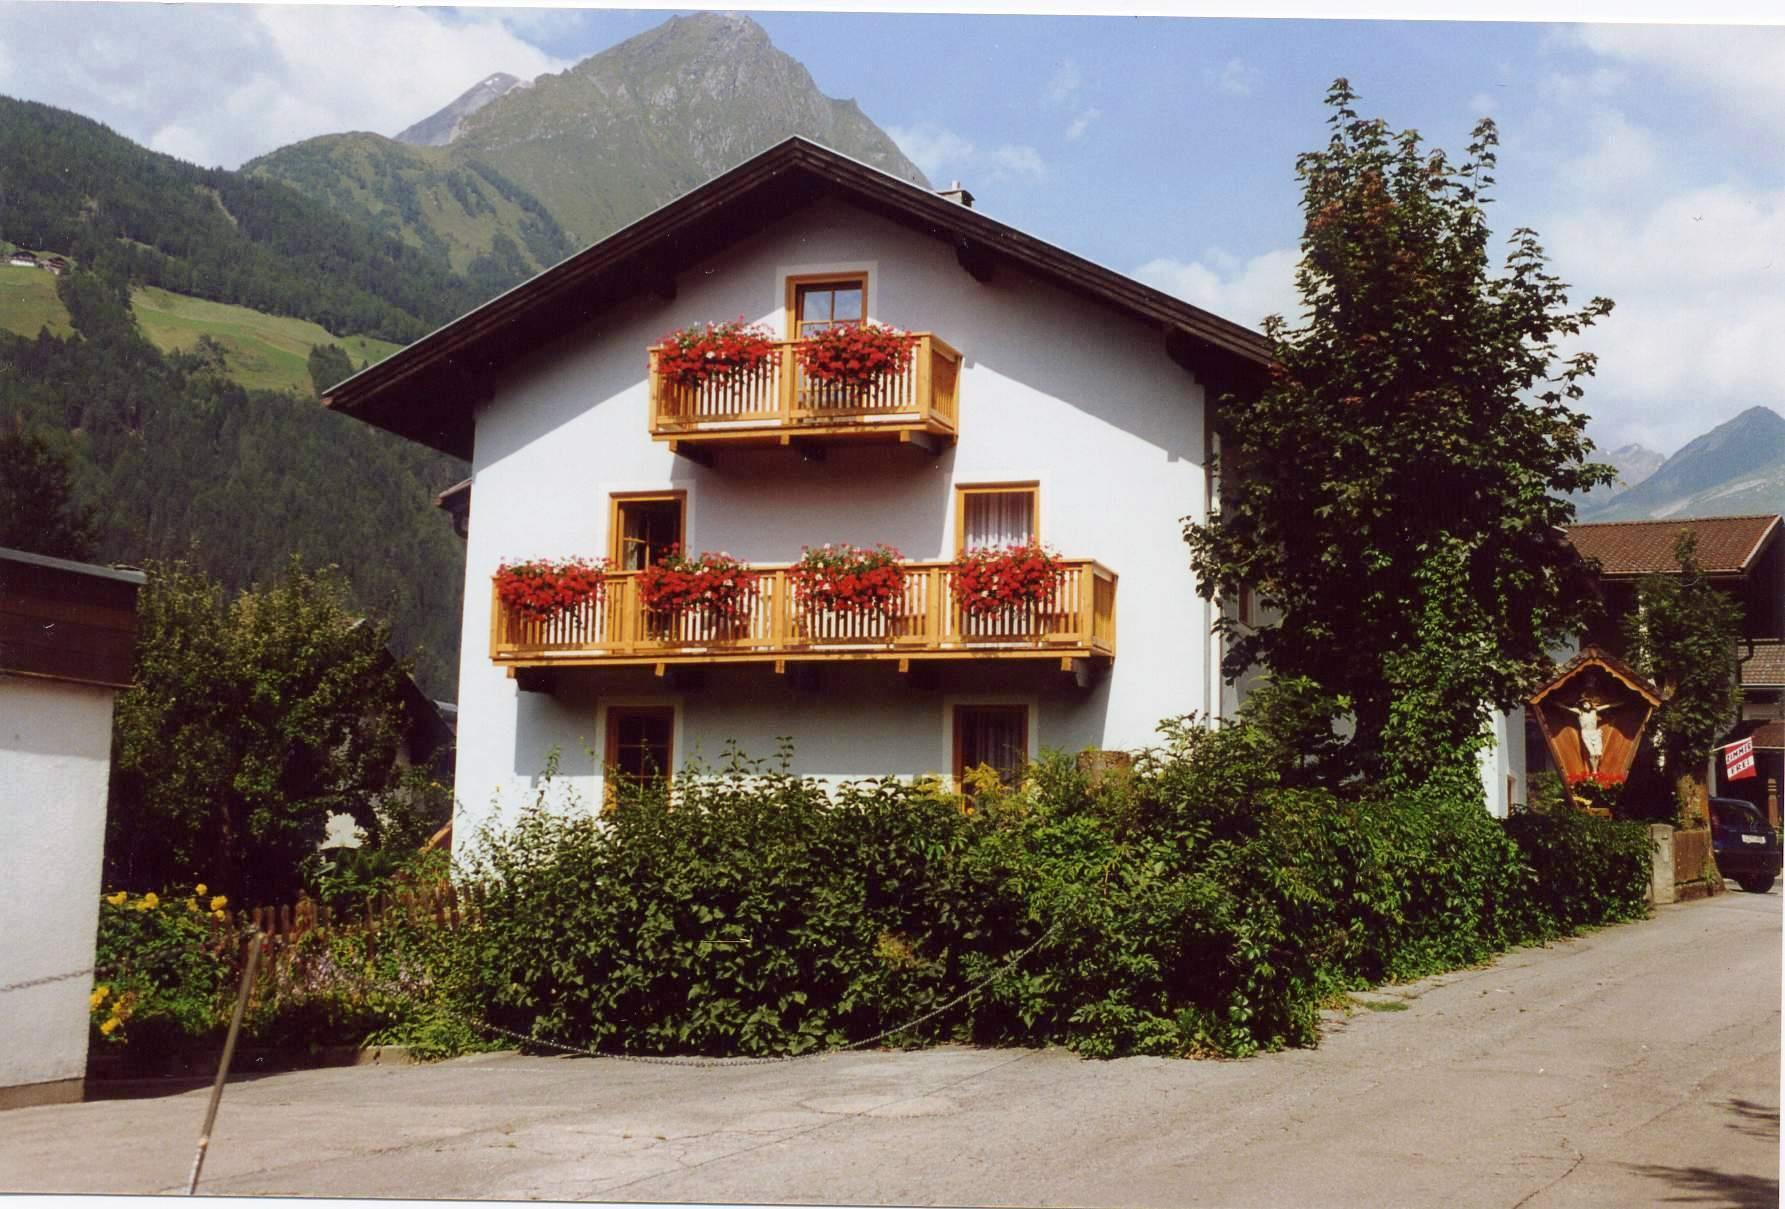 Haus-Amoser-Elfriede-Sommer.jpg